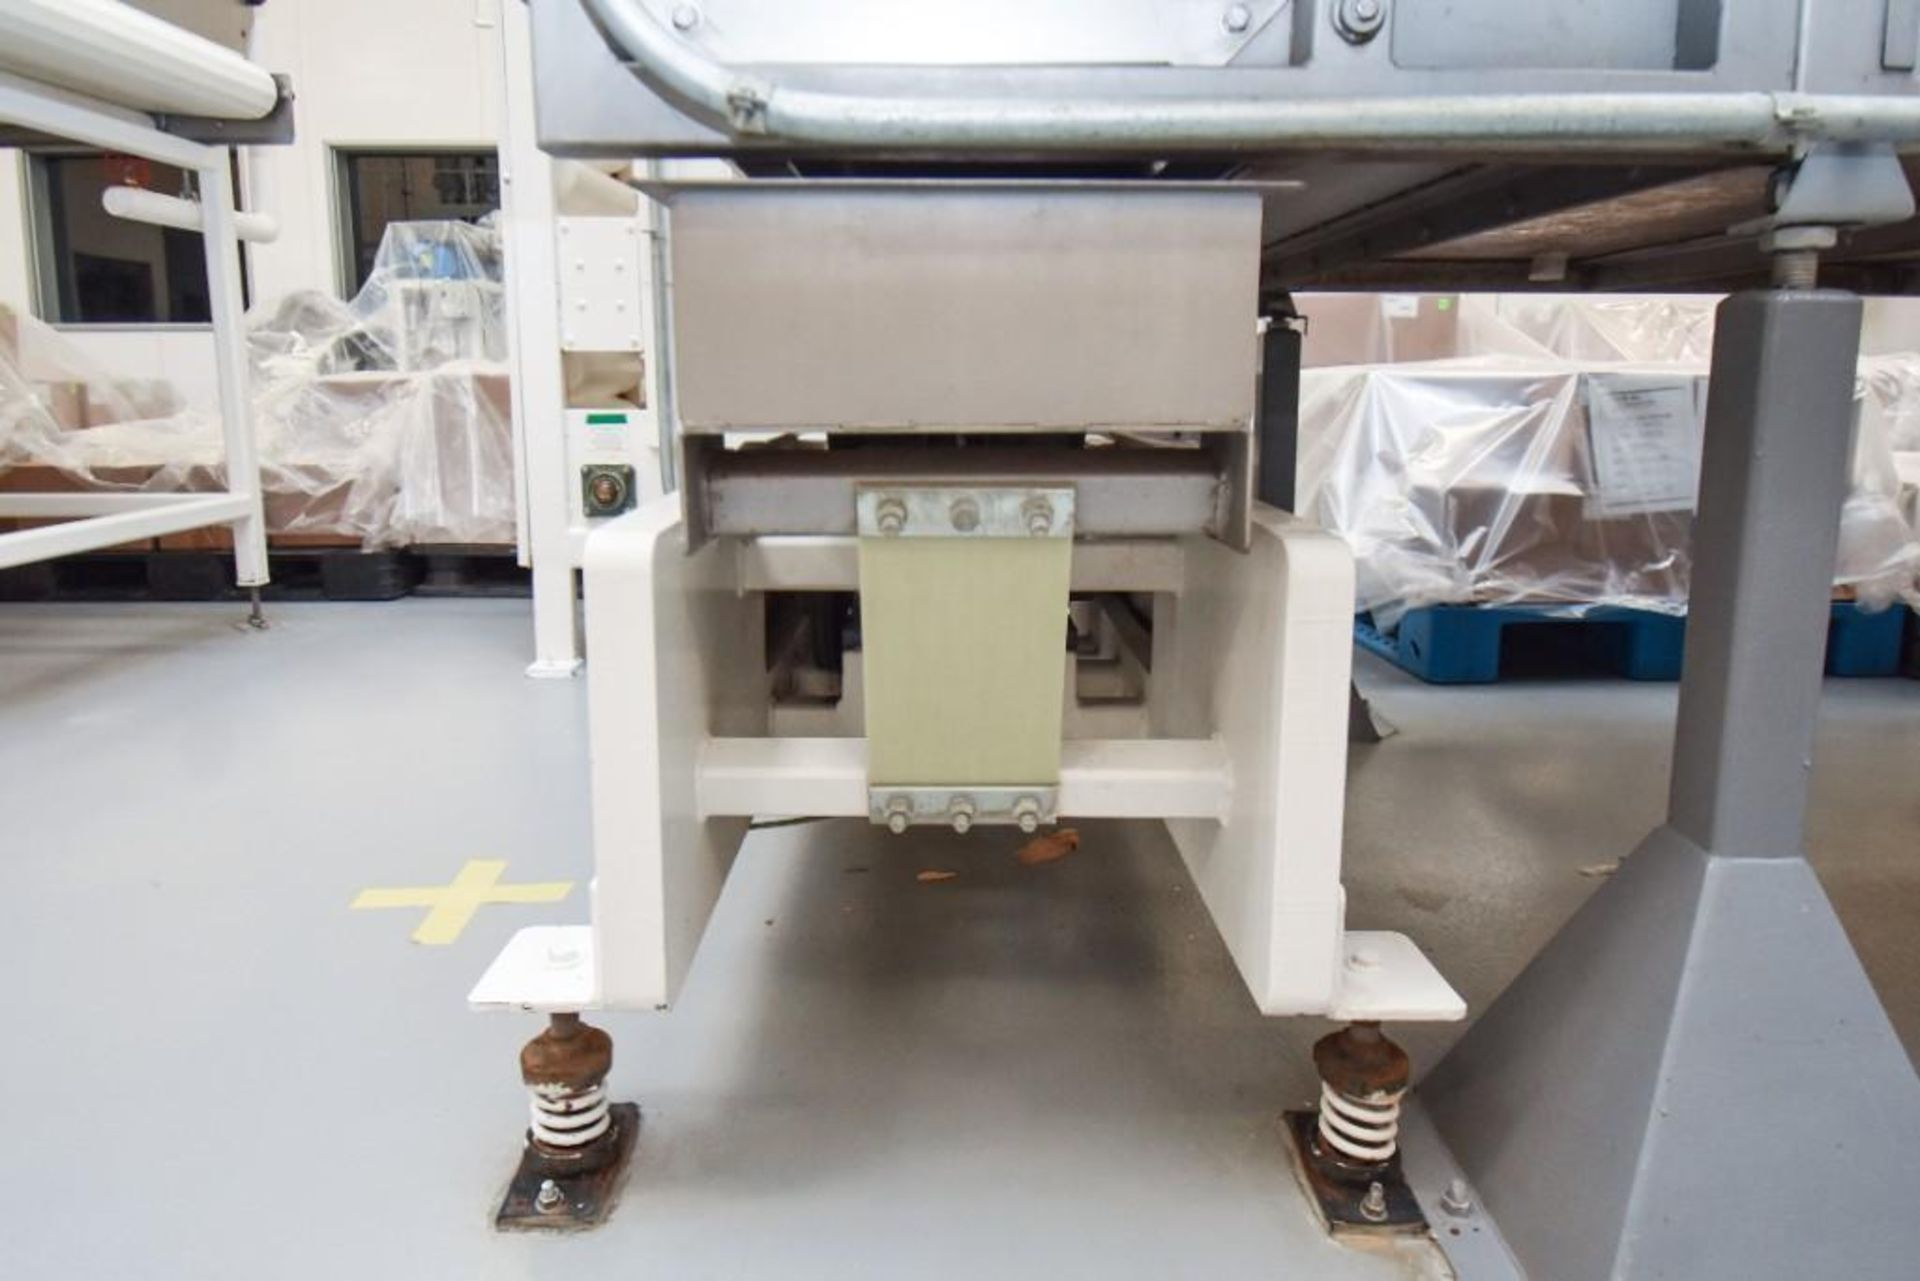 RBM Vibratory Deck VCNF-15X6X7 - Image 3 of 6